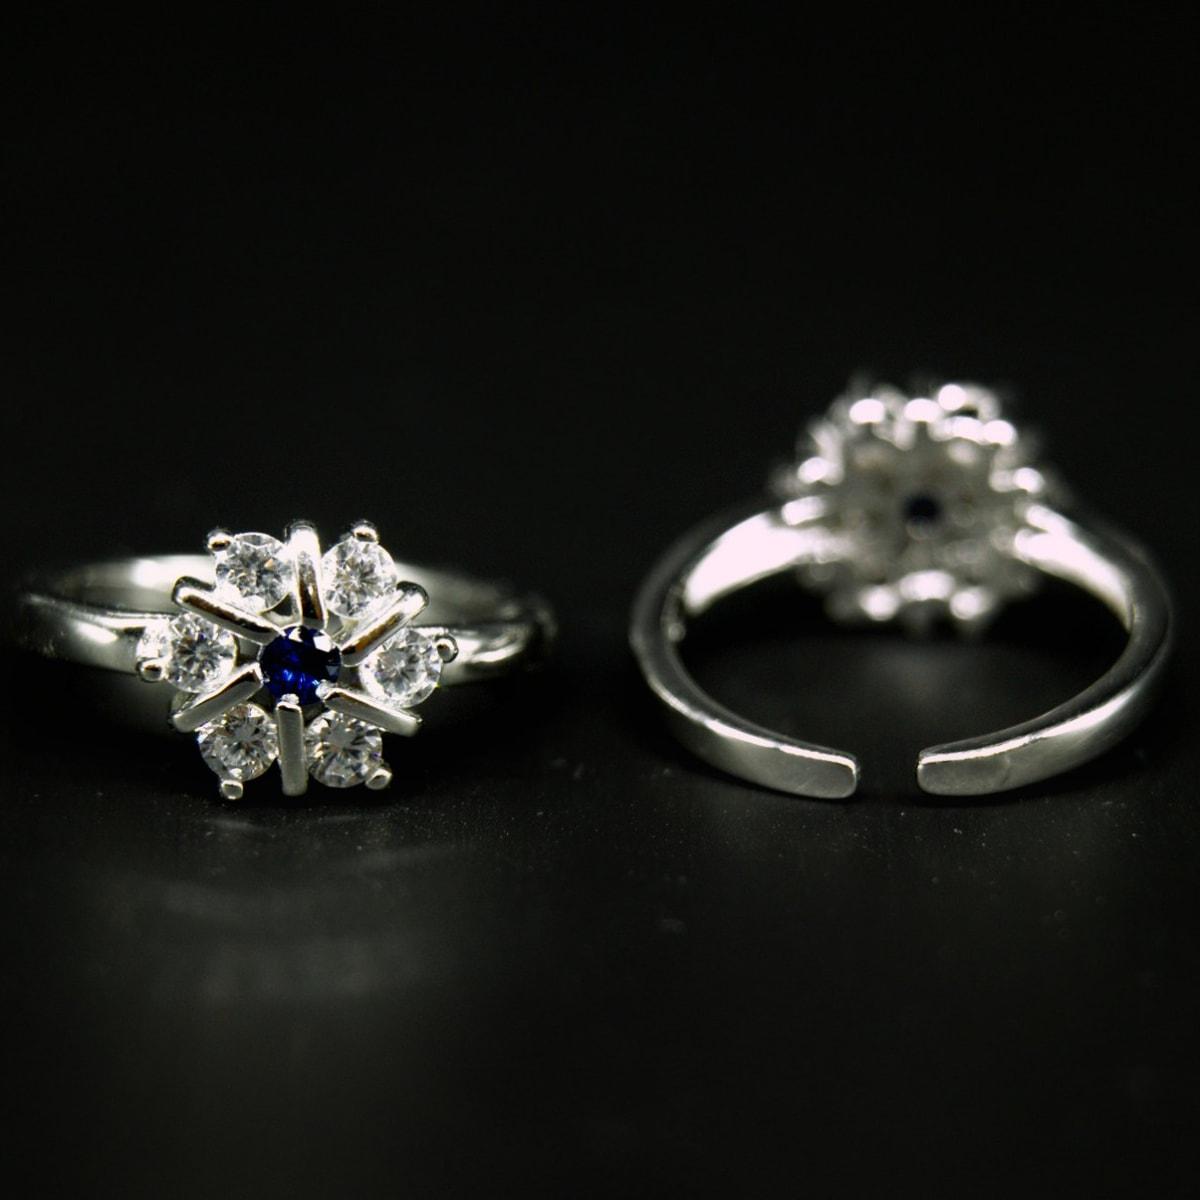 925 Silver Royal Toe Rings